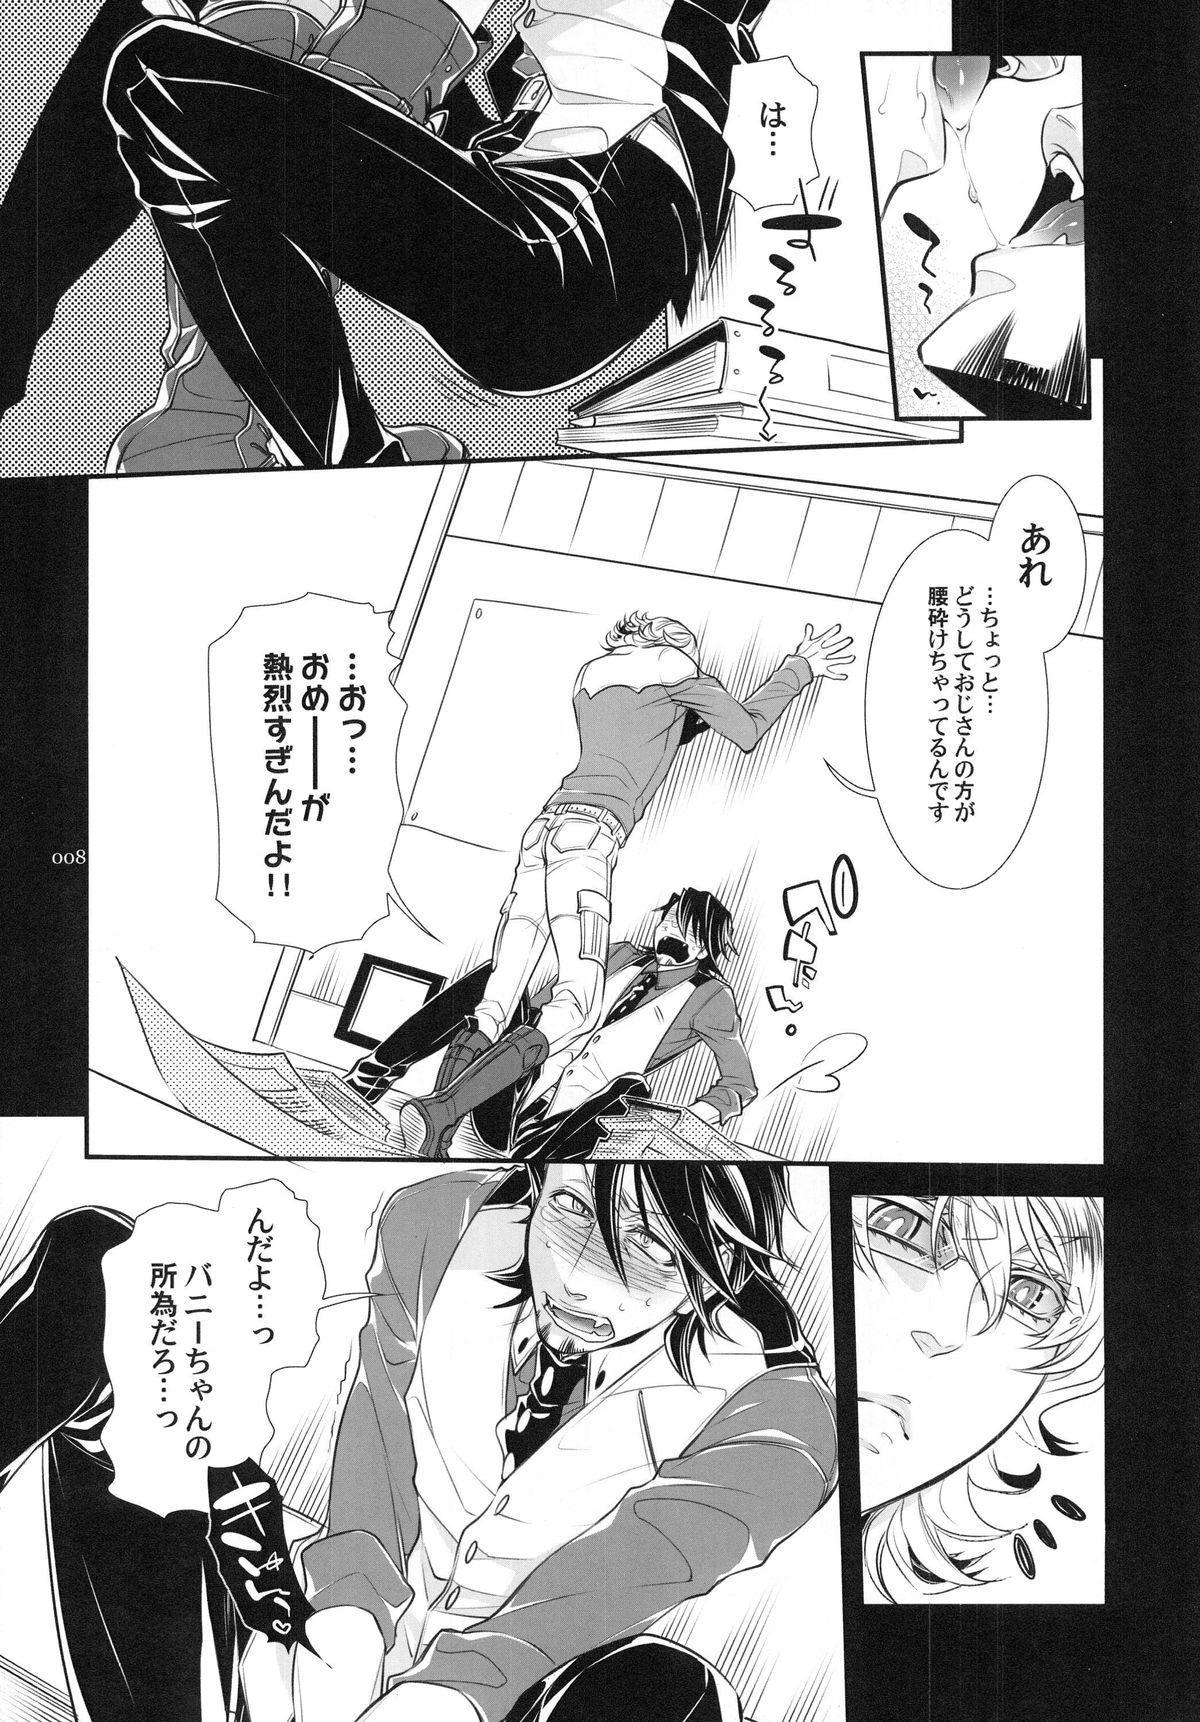 Bunny-chan to Iikoto Shiyokka 7